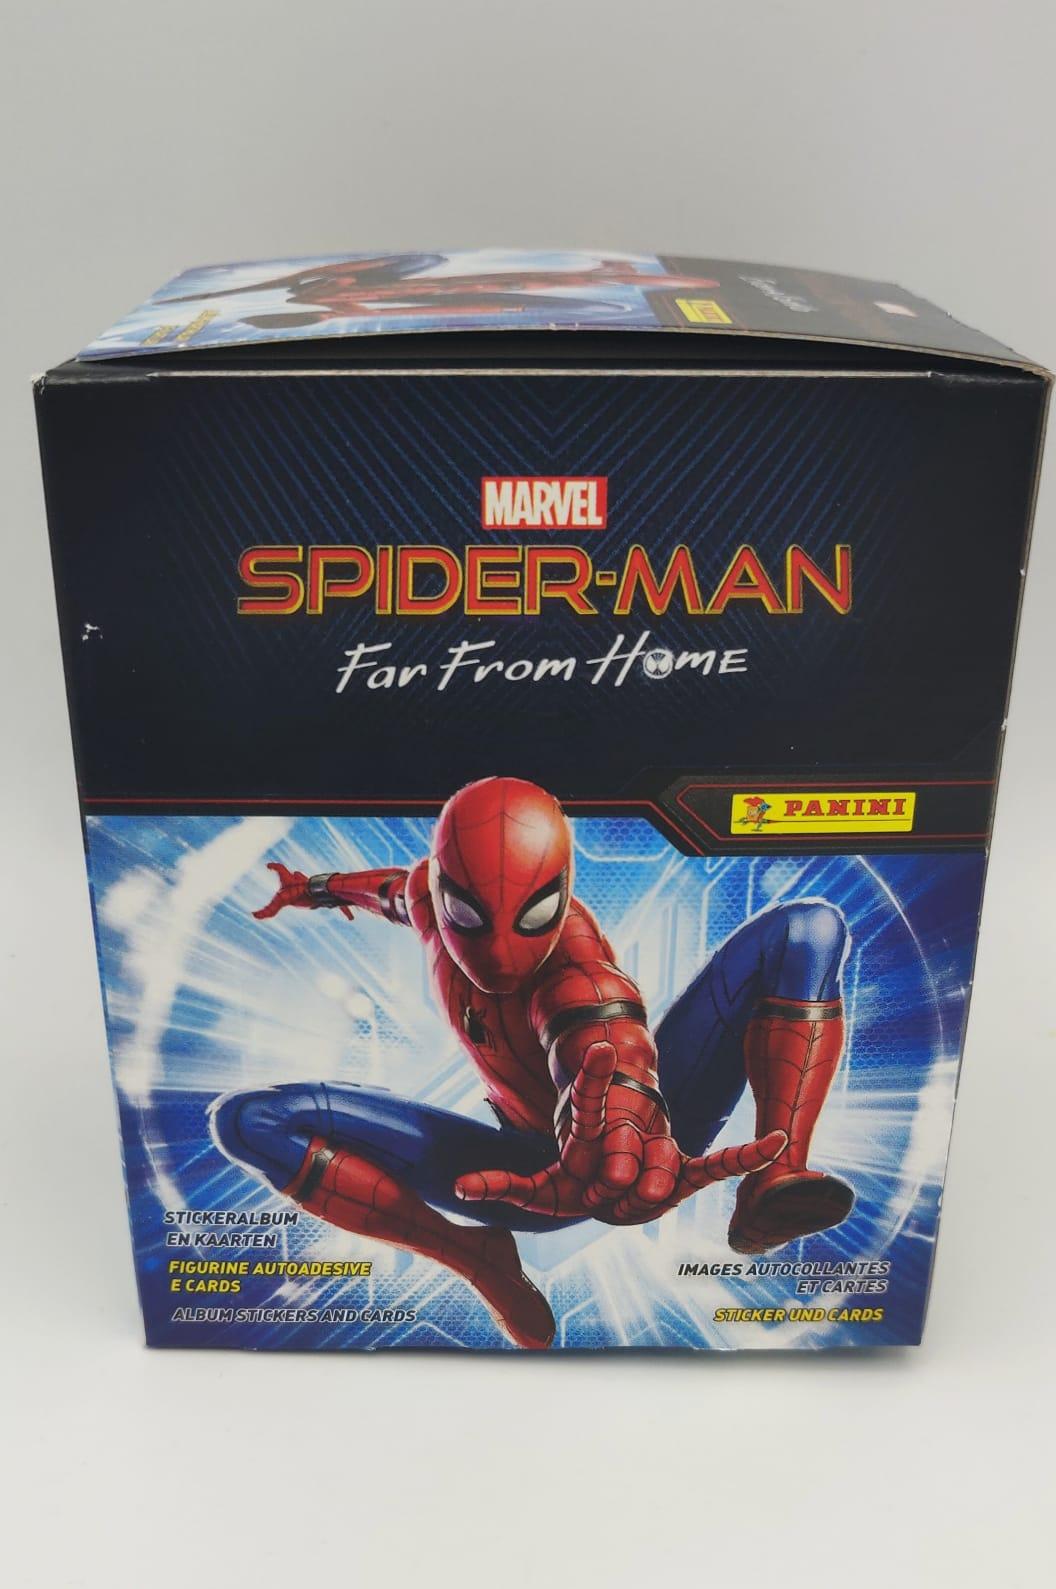 SPIDERMAN FAR FROM HOME Box 36 bustine figurine Panini 2019